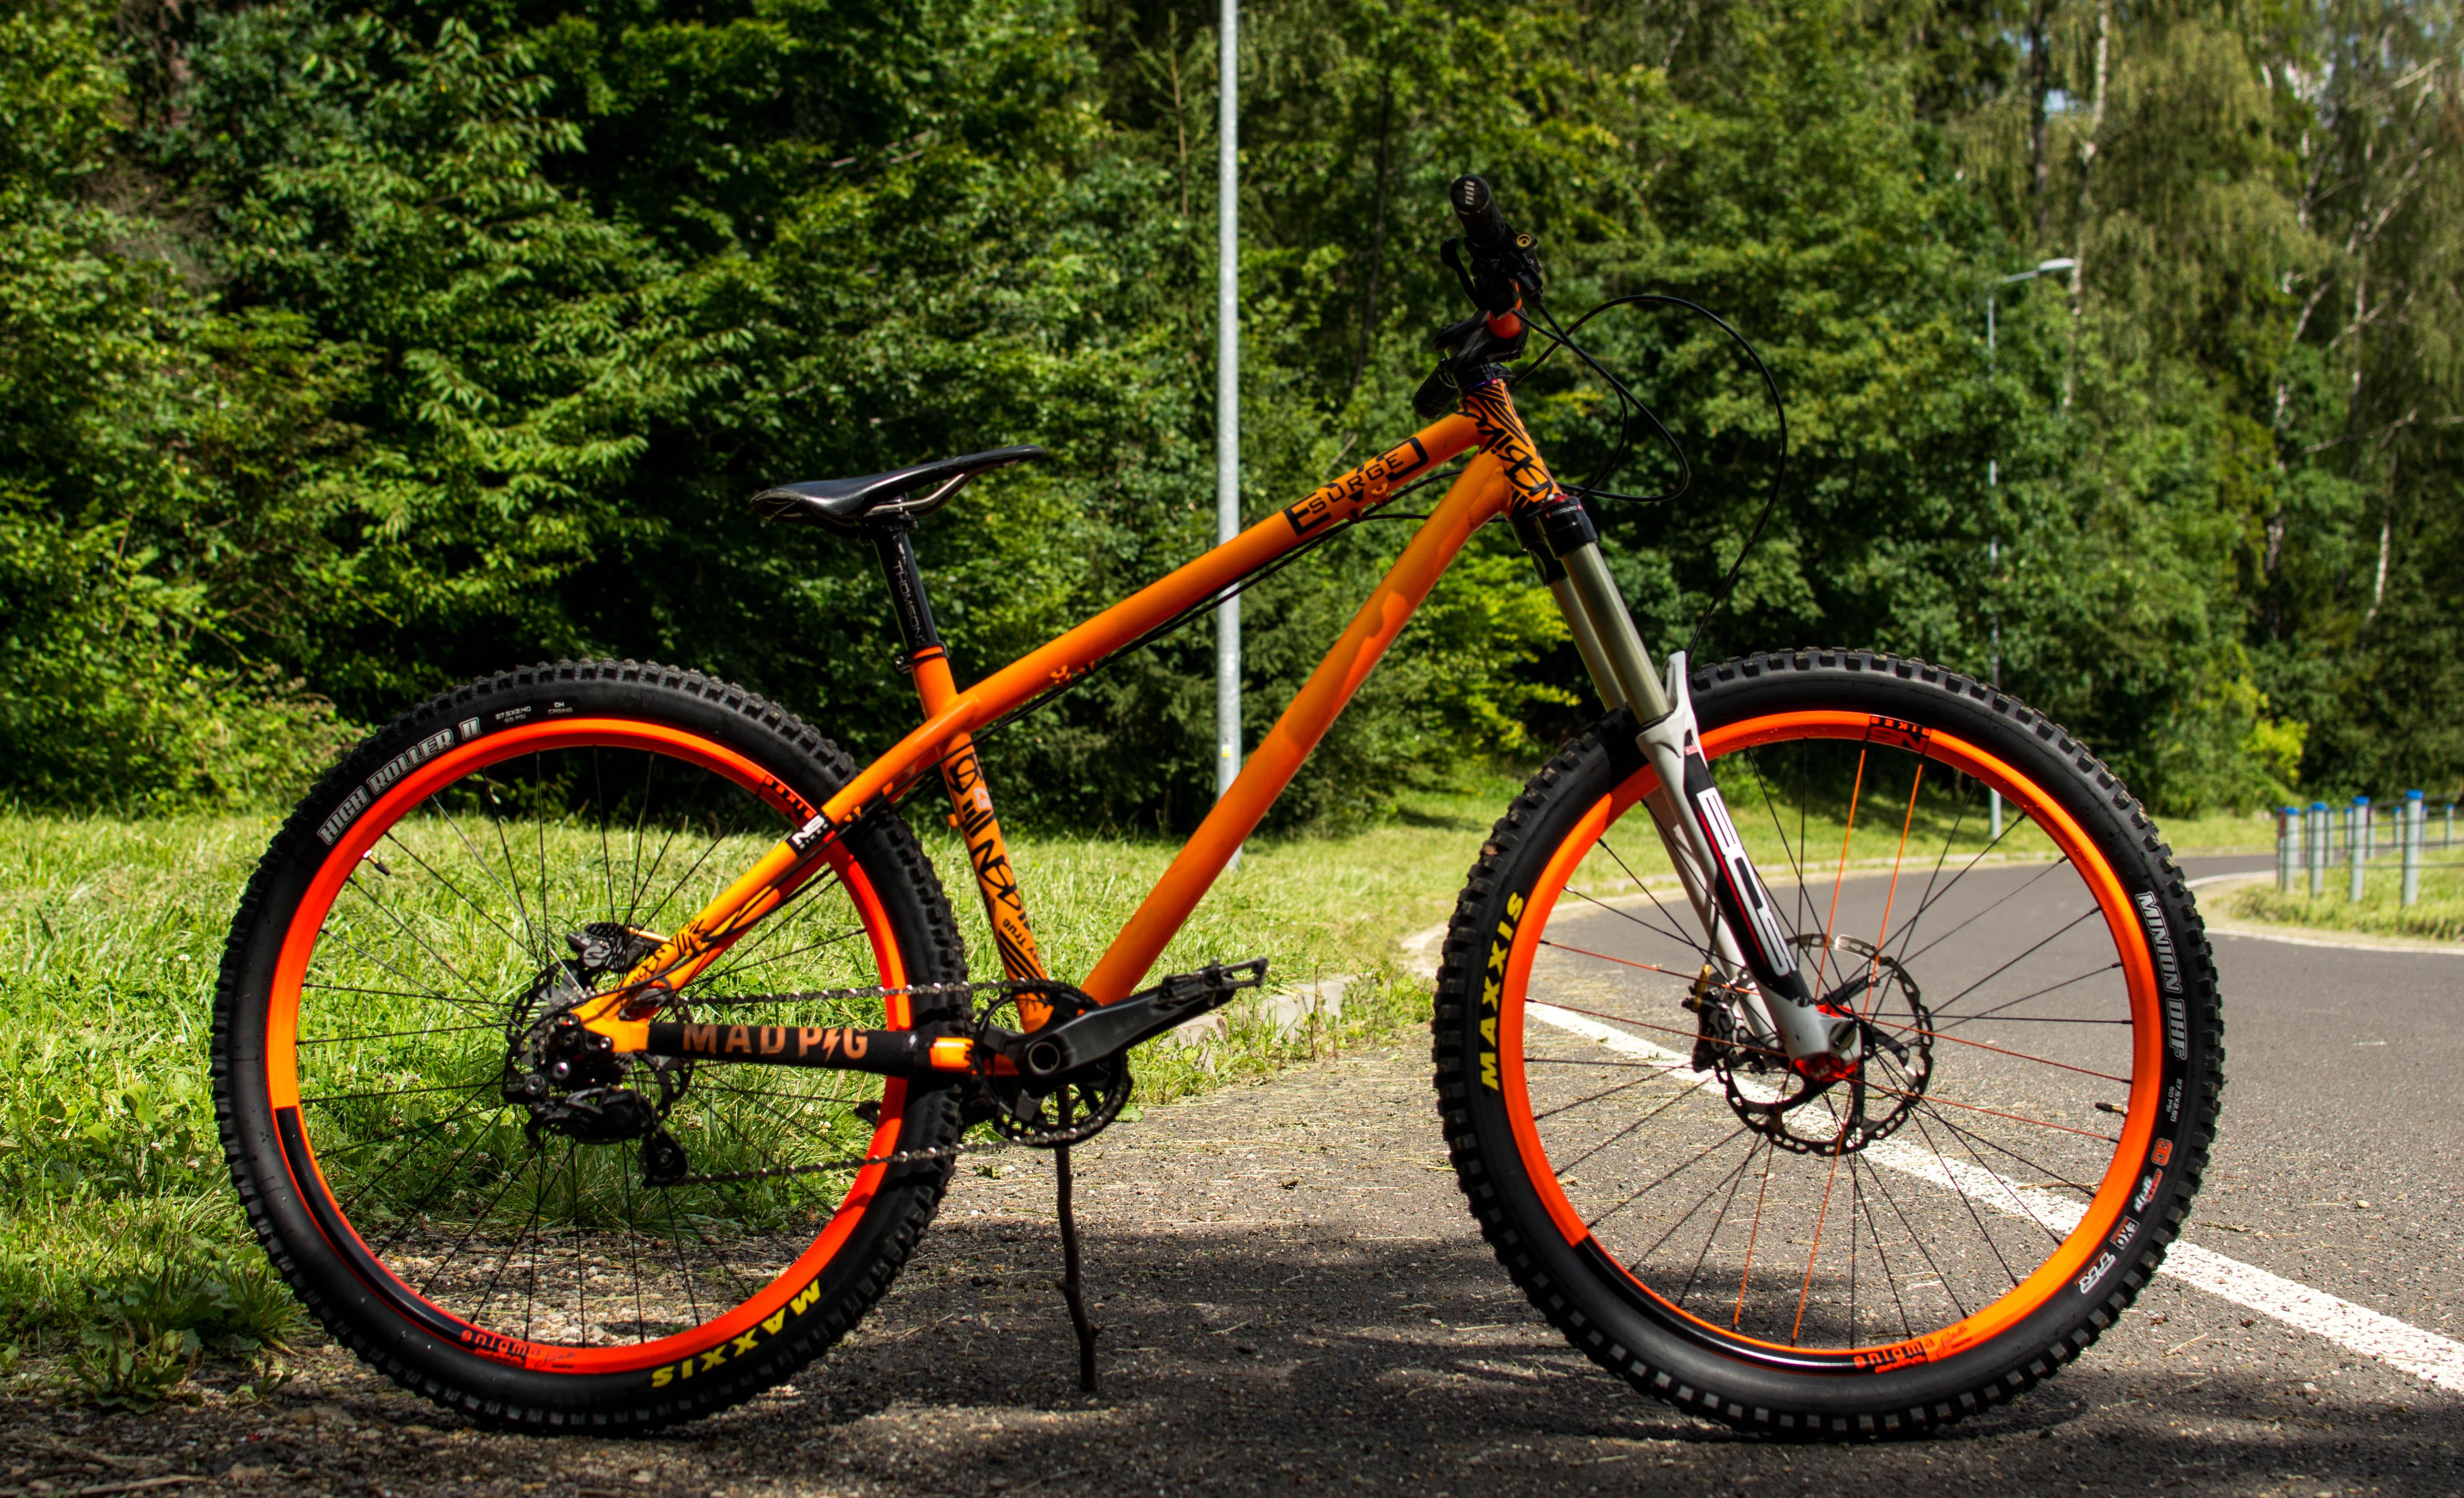 Save up to 60% off new Mountain Bikes - MTB - Motobecane